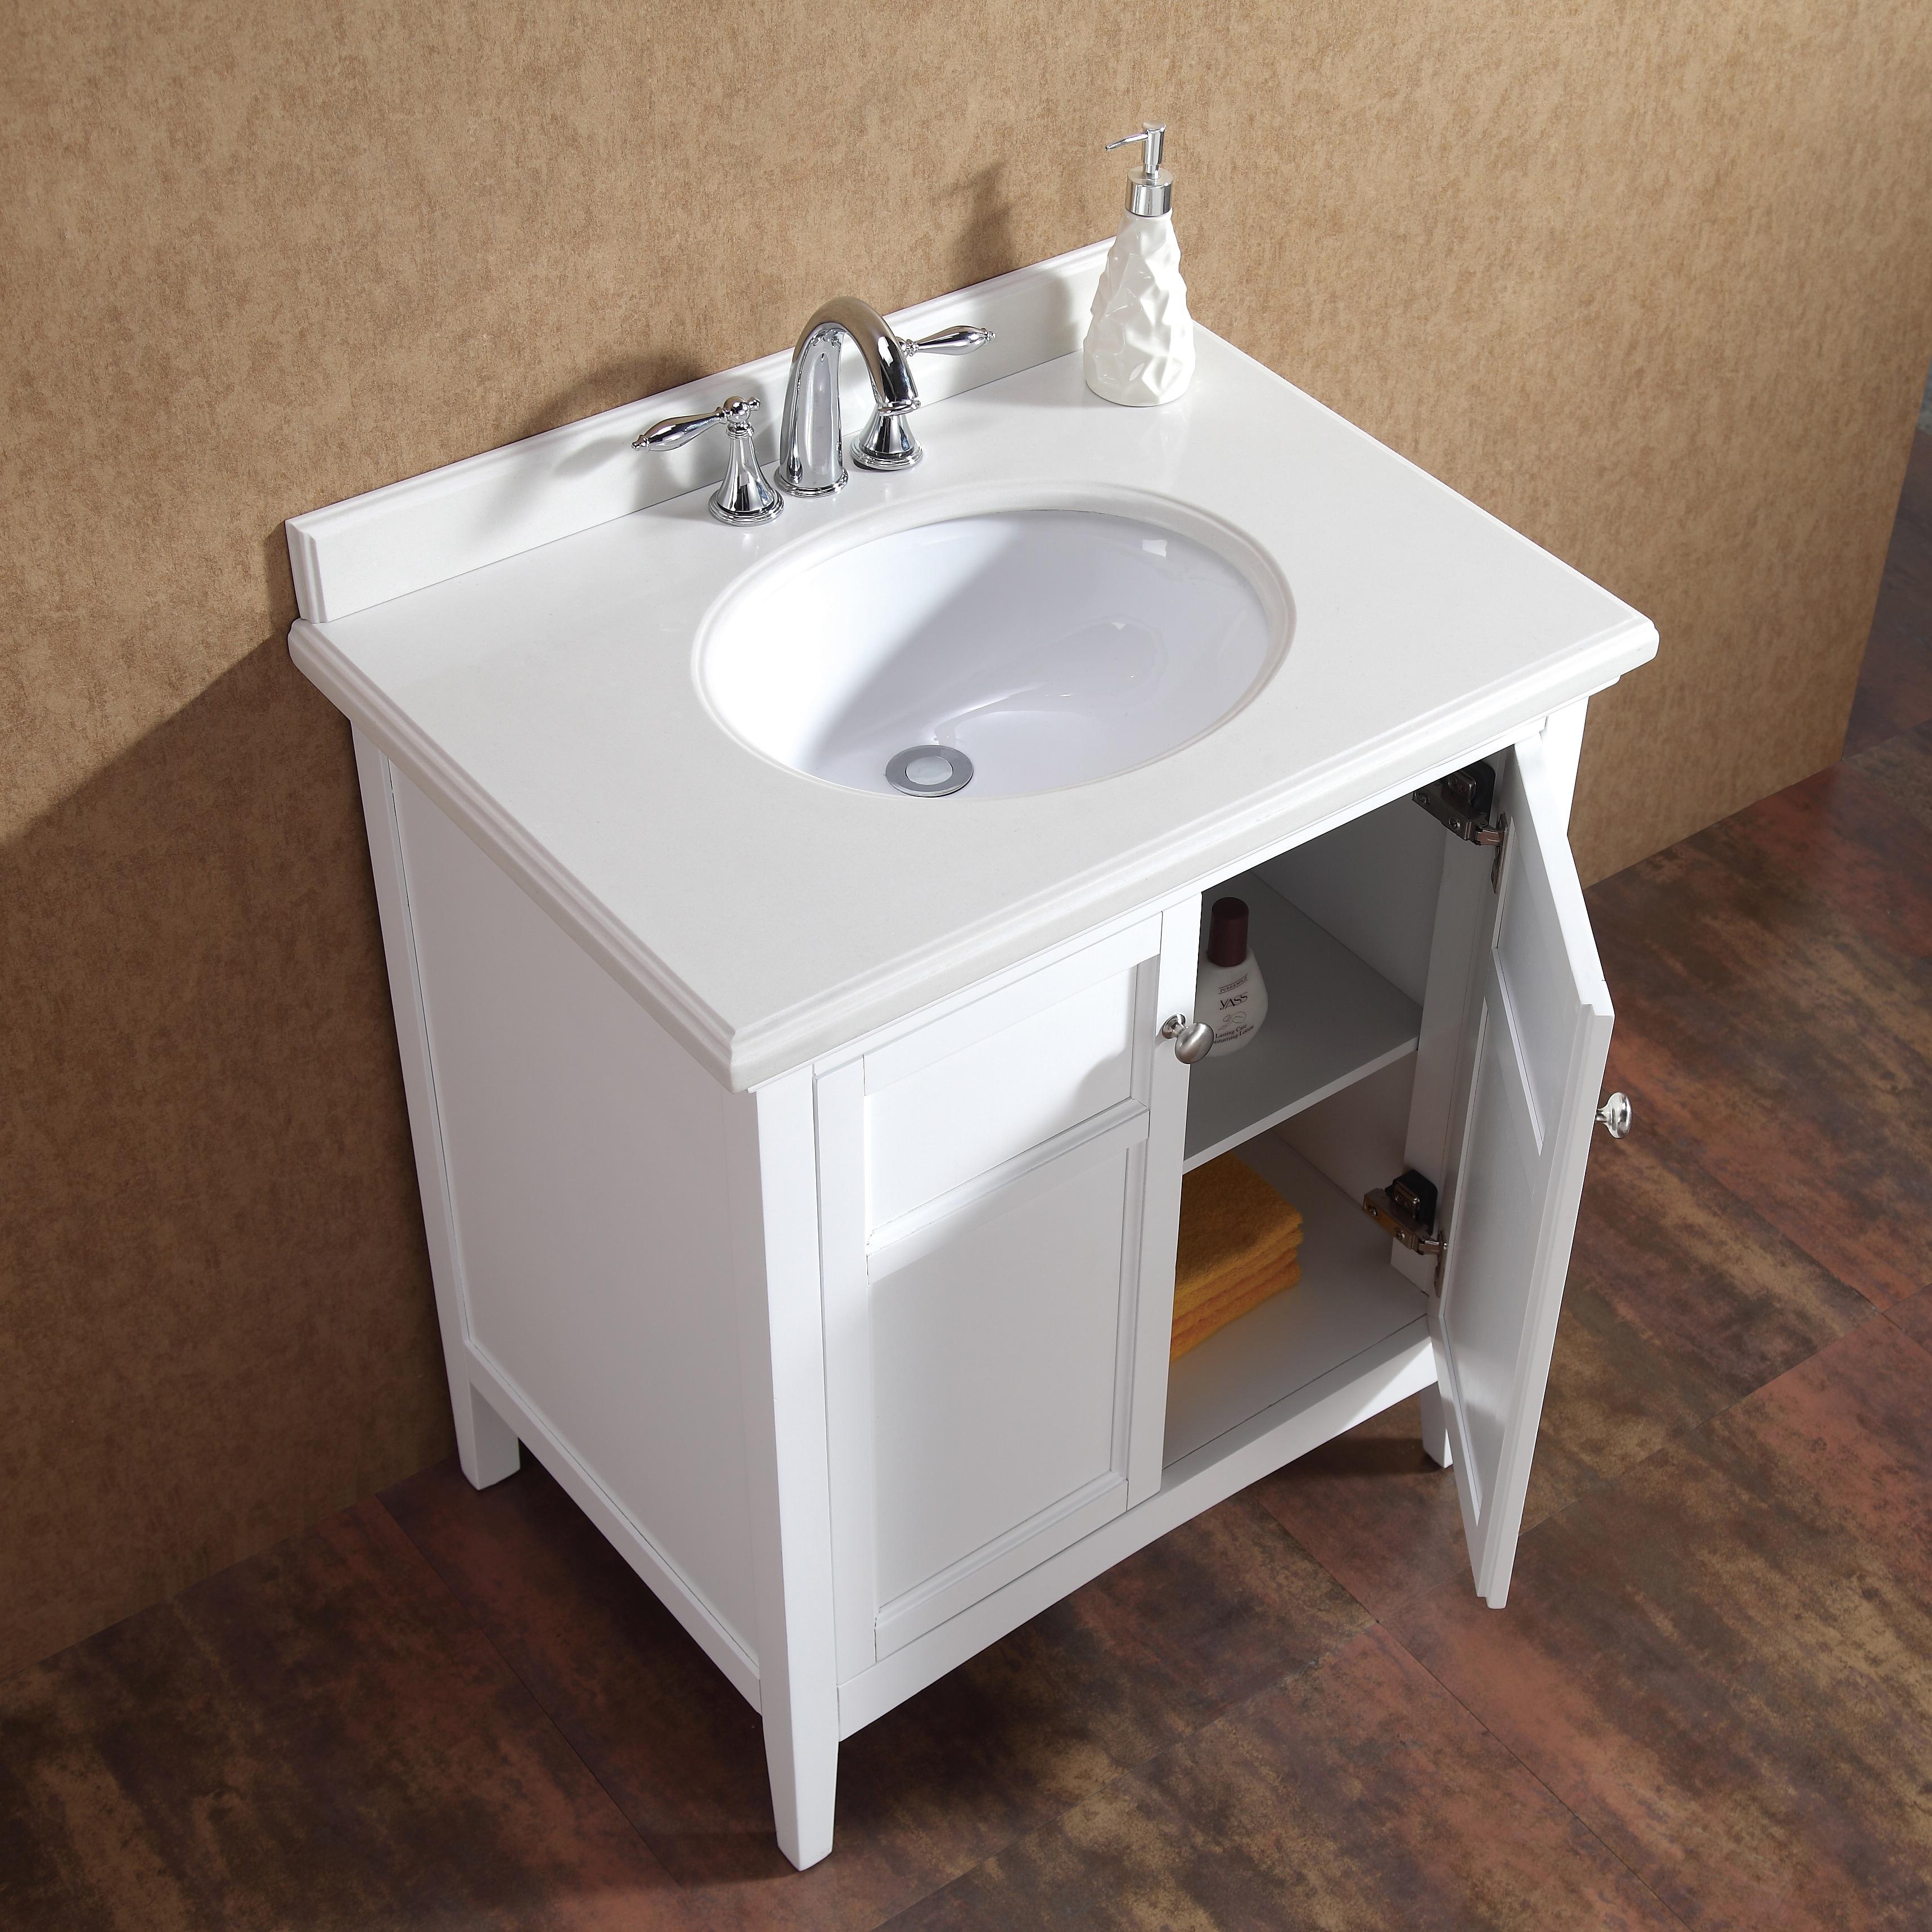 83 Inch Bathroom Vanity ove decors campo 30-inch single sink bathroom vanity with granite